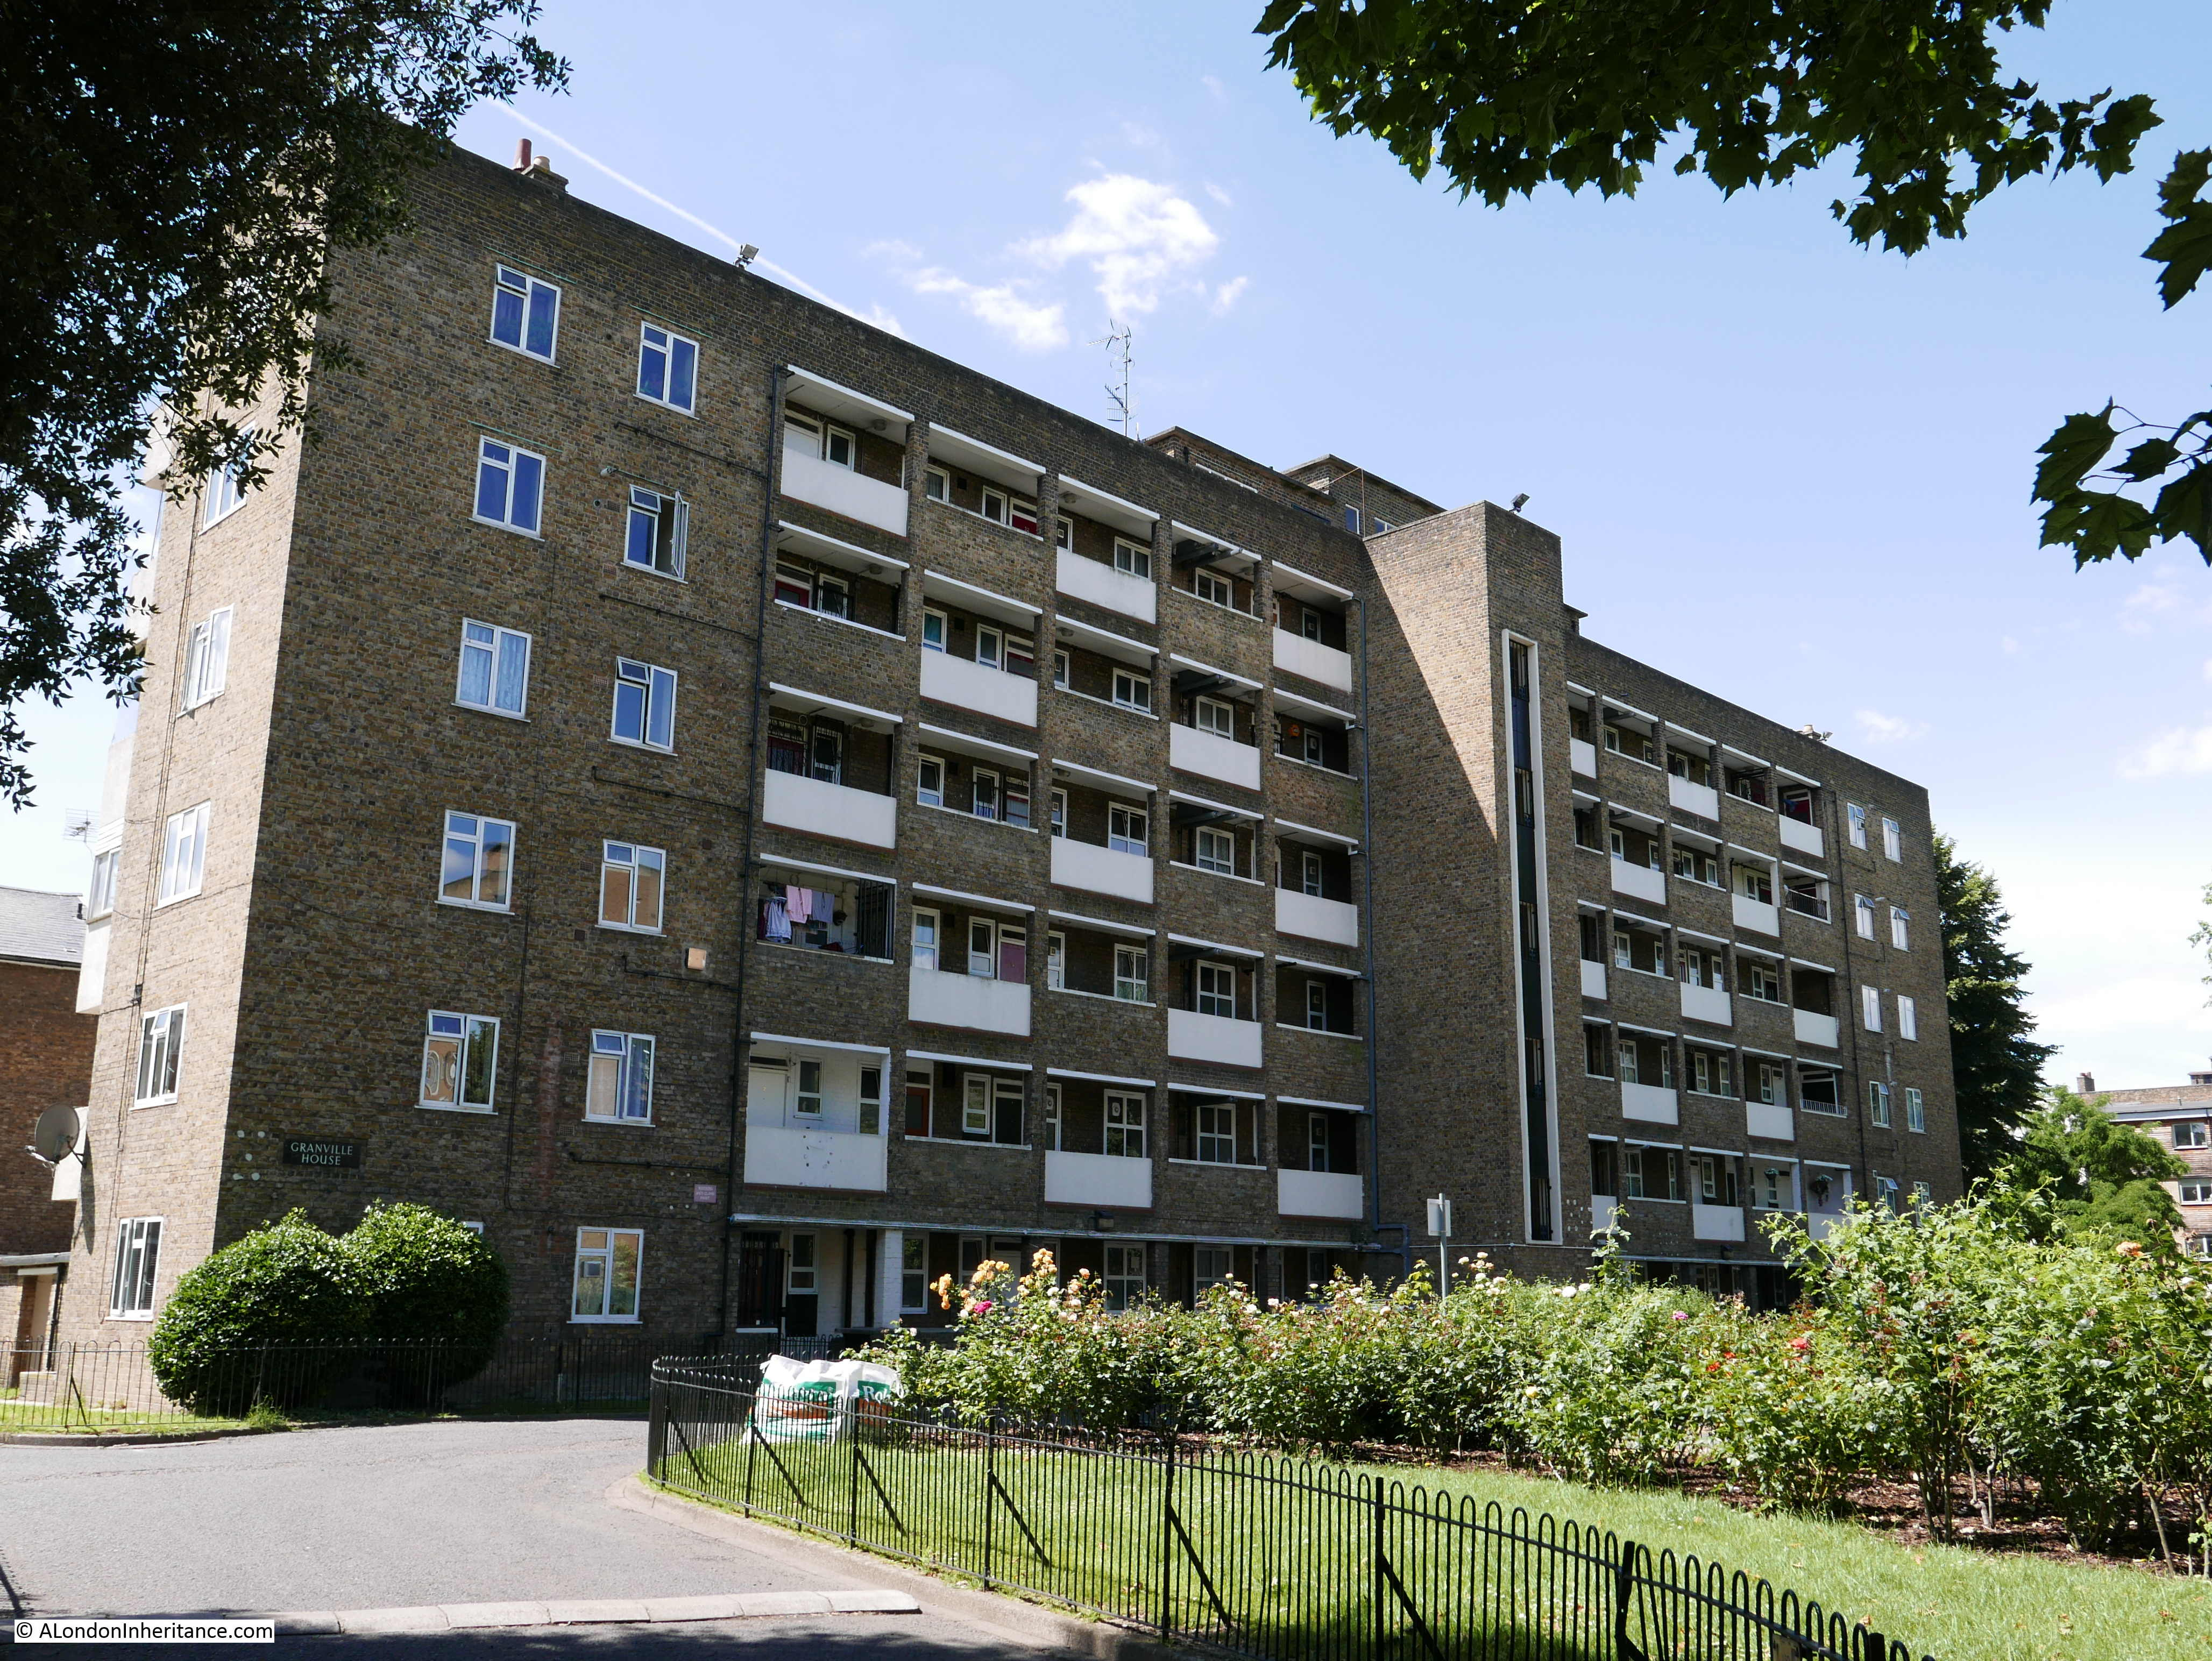 Poplar Archives A London Inheritance